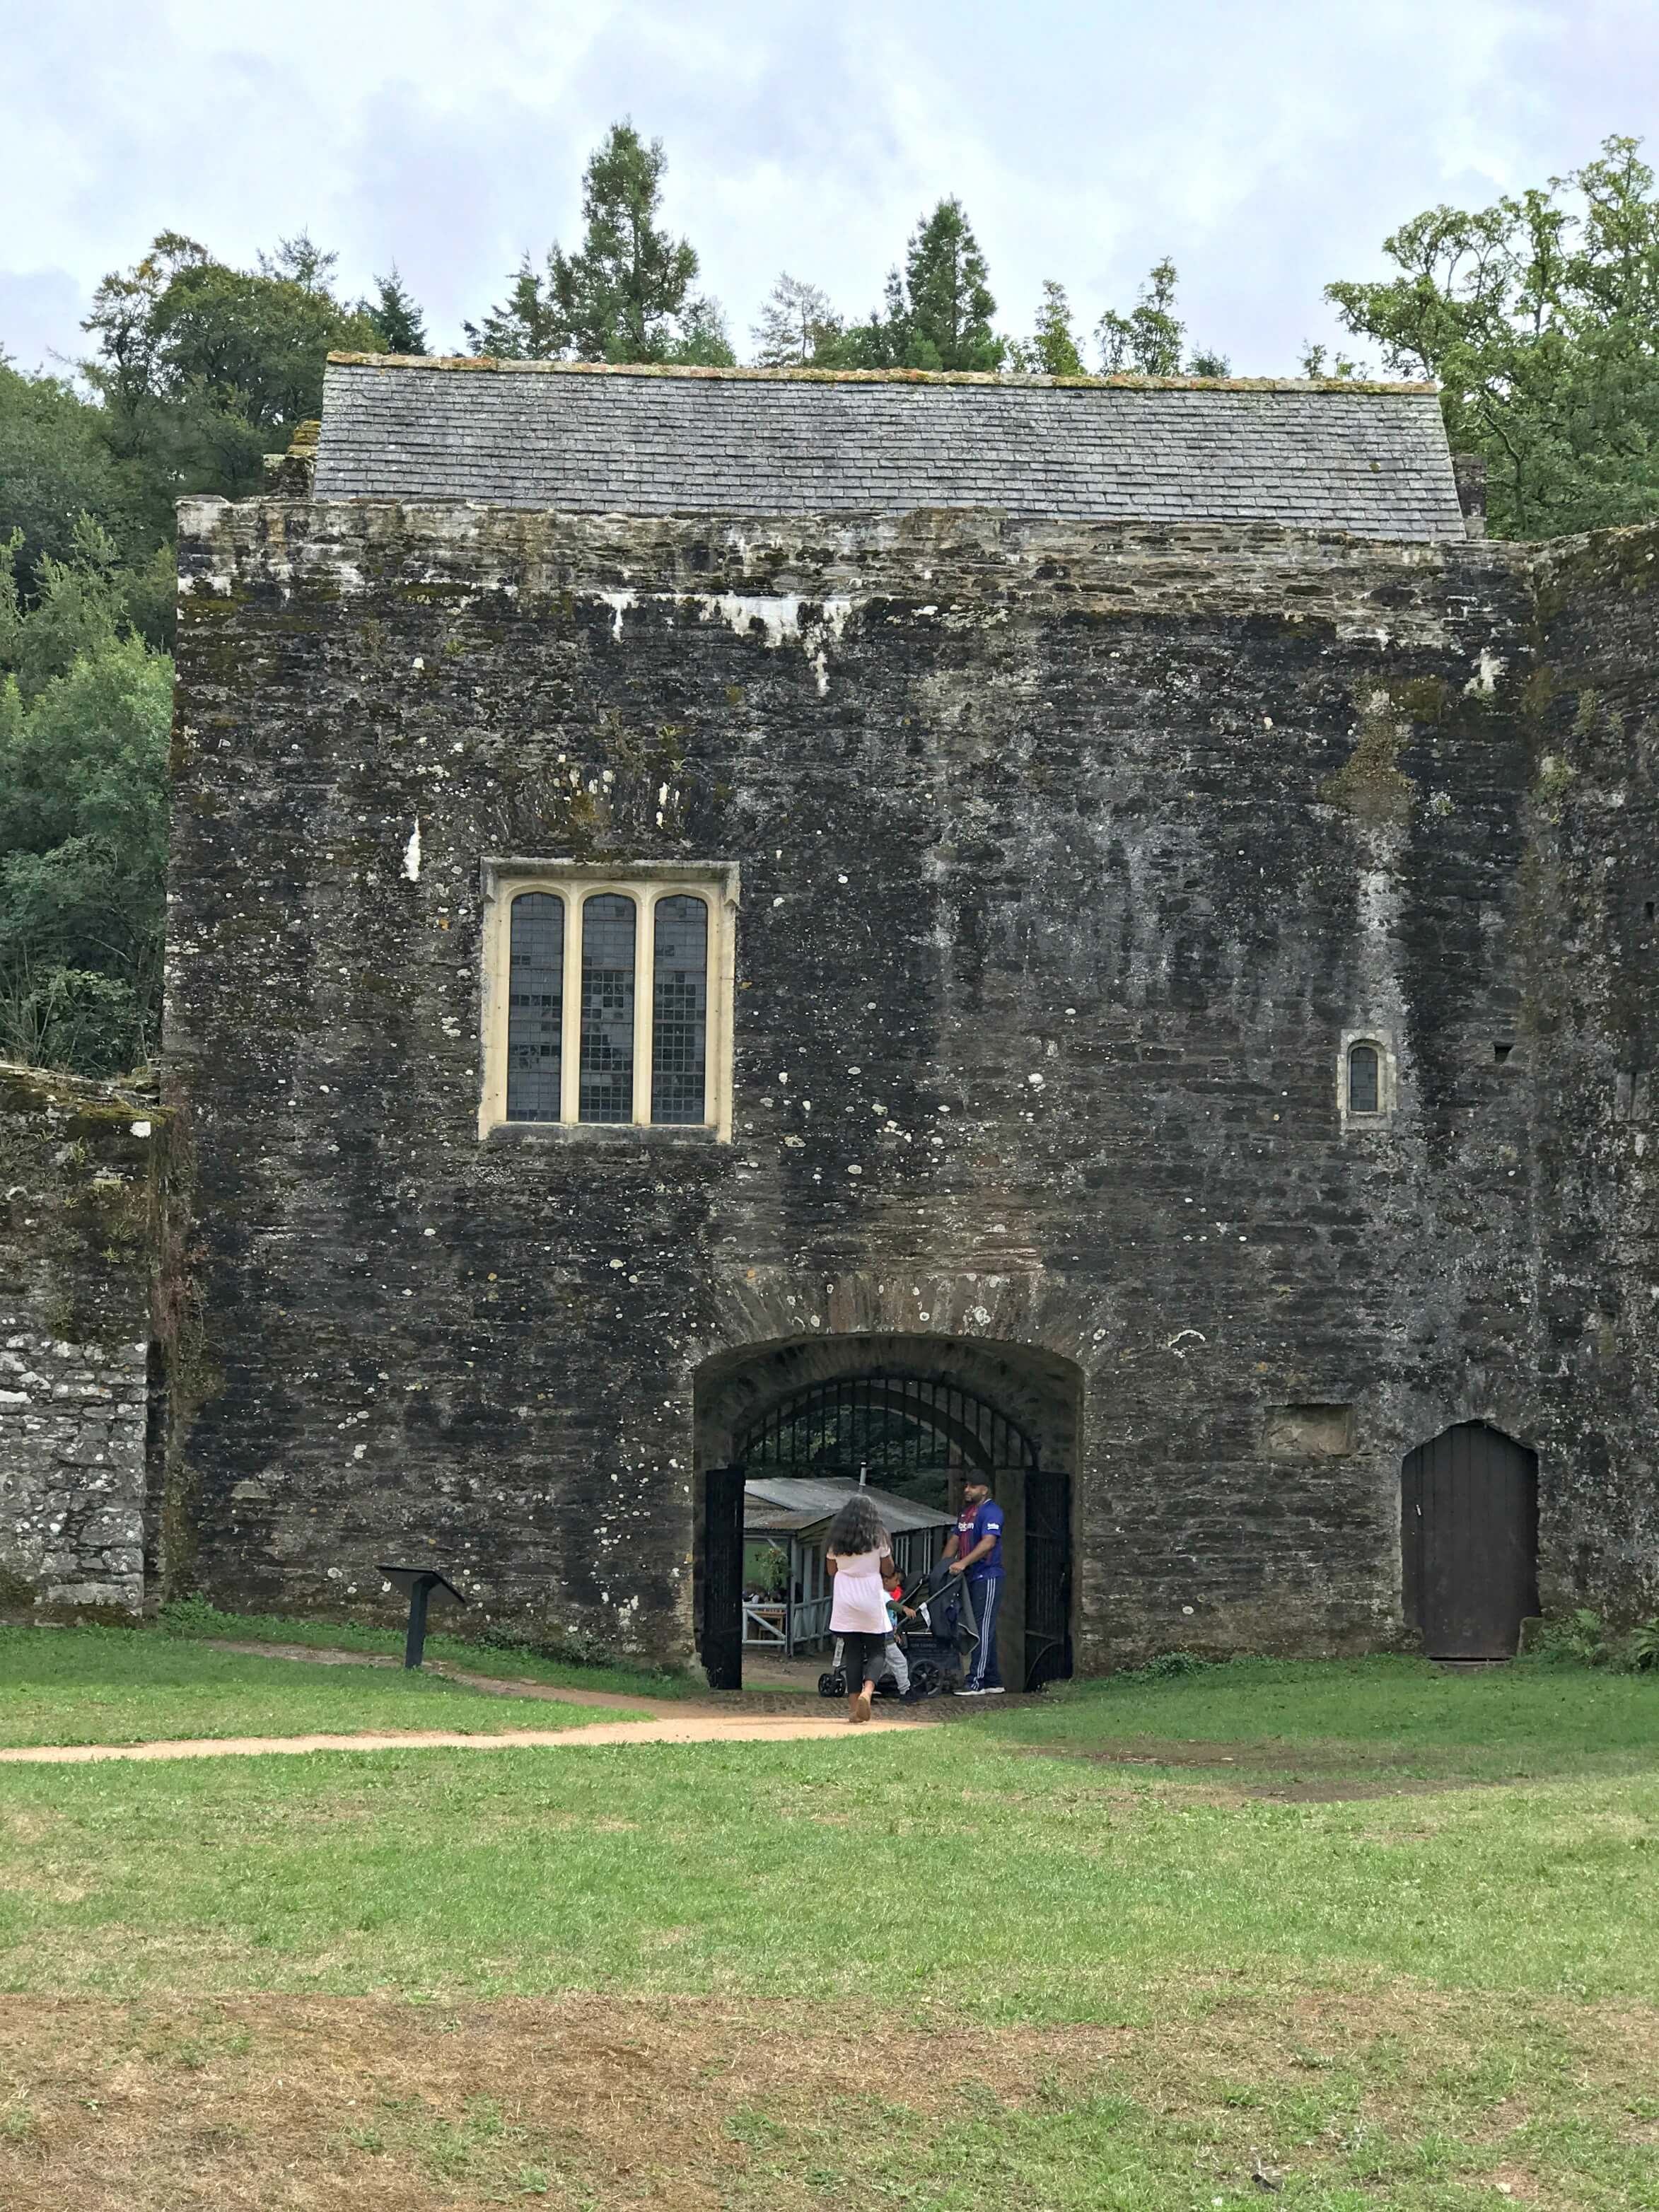 Berry Pomeroy Castle, Totnes, Devon